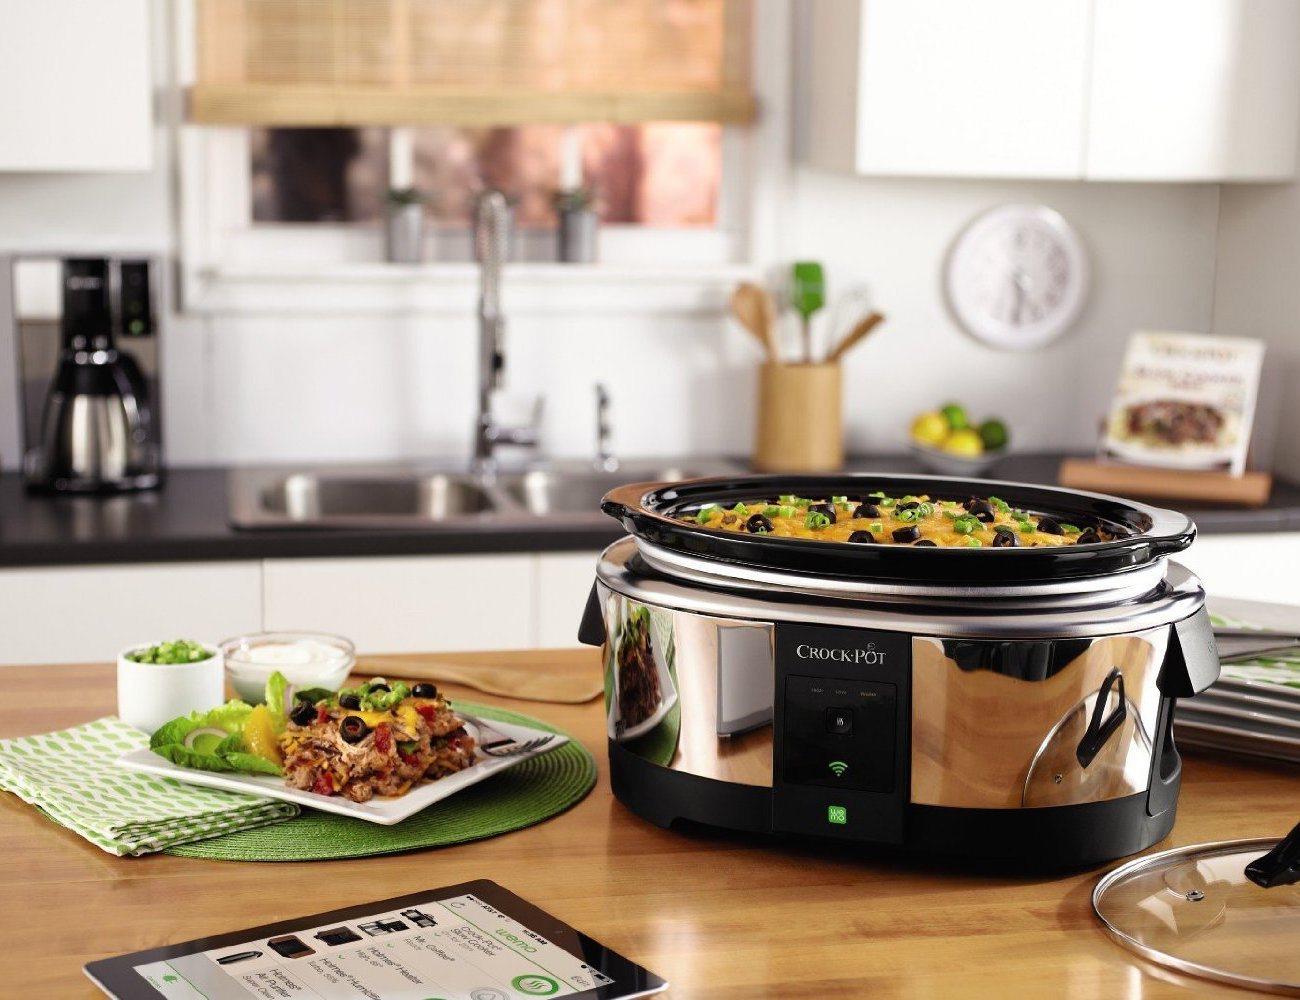 Crock-Pot – Smart Slow Cooker by WeMo